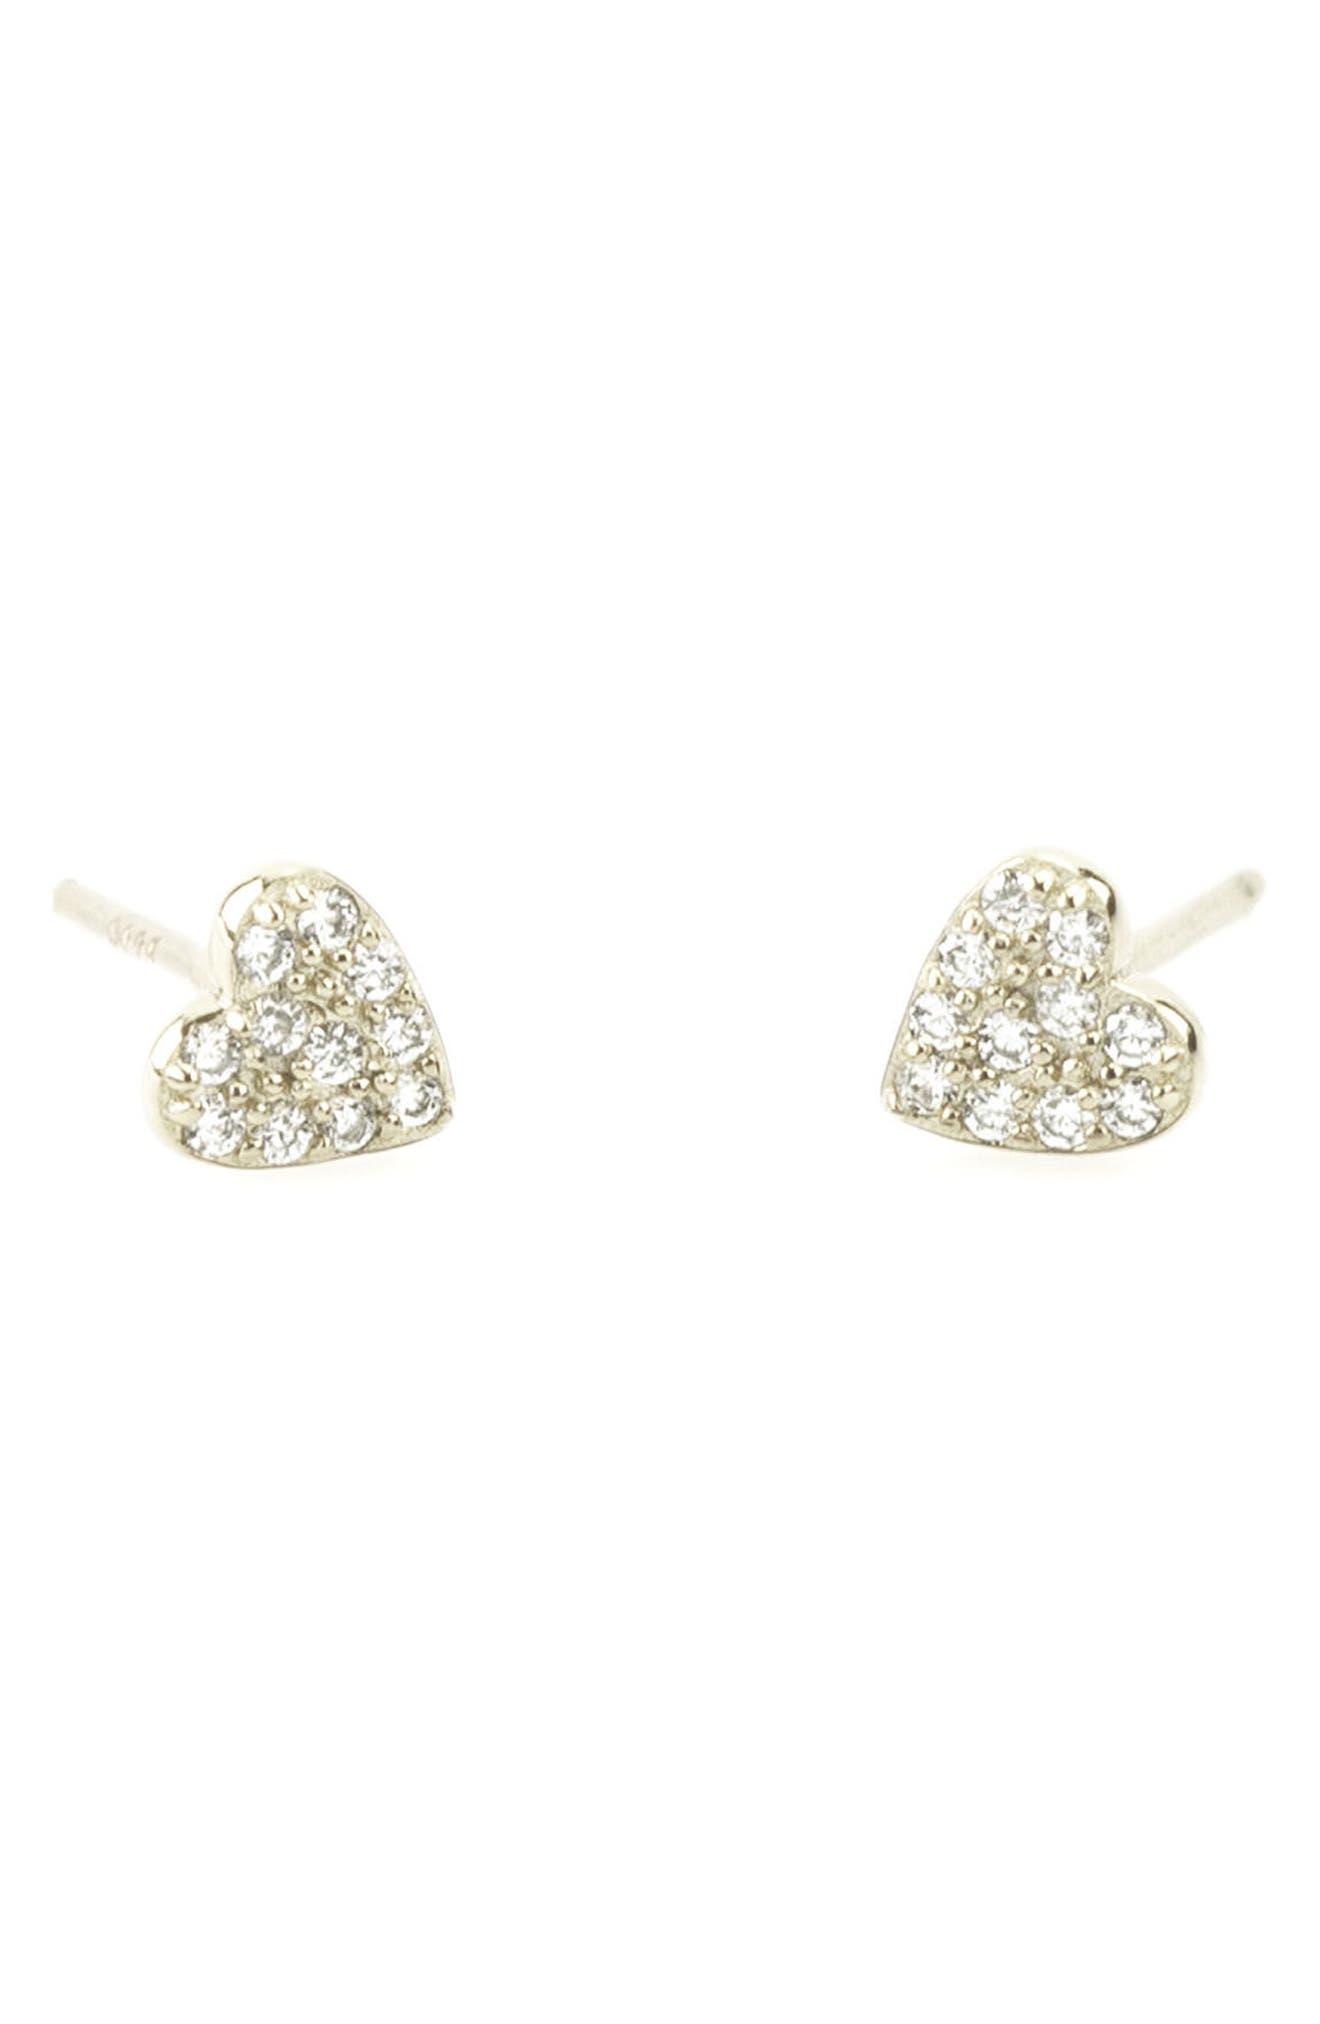 Alternate Image 1 Selected - Kris Nations Pavé Heart Stud Earrings